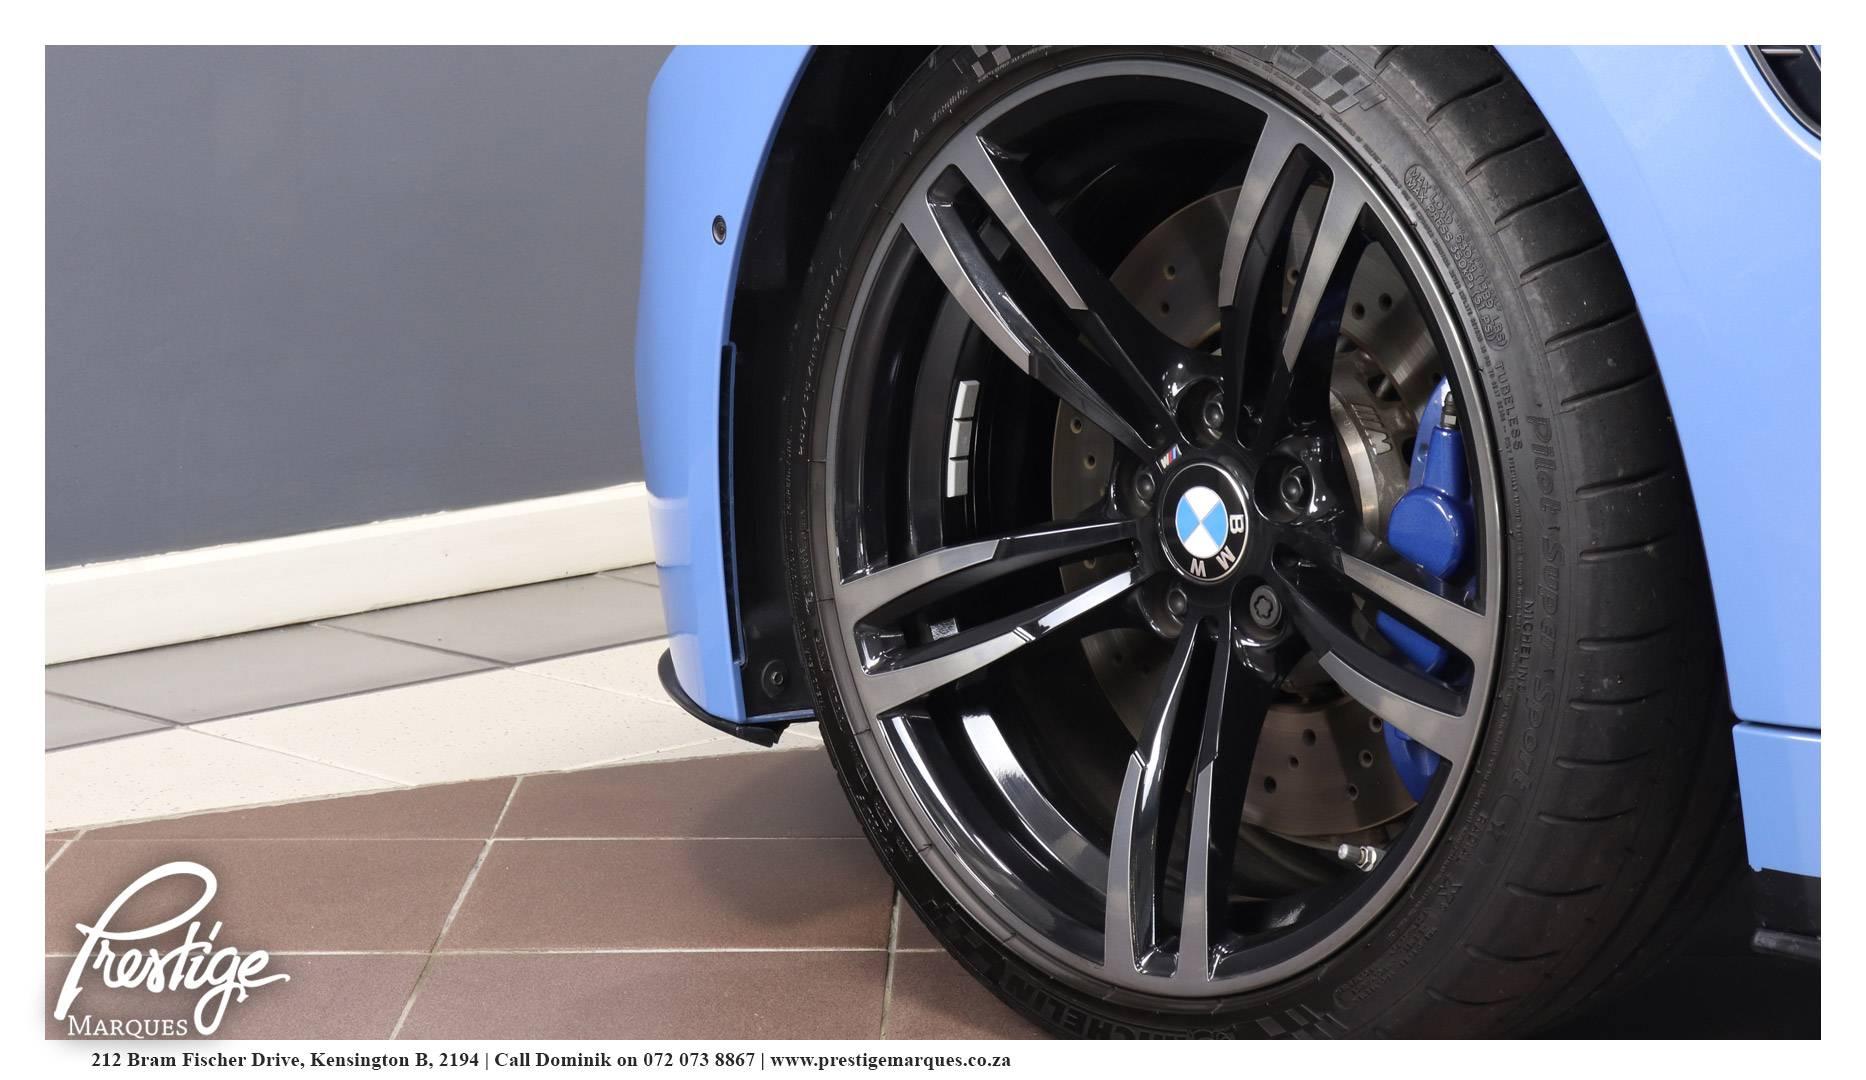 2015-BMW-M4-Coupe-Blue-Prestige-Marques-Randburg-Sandton-13